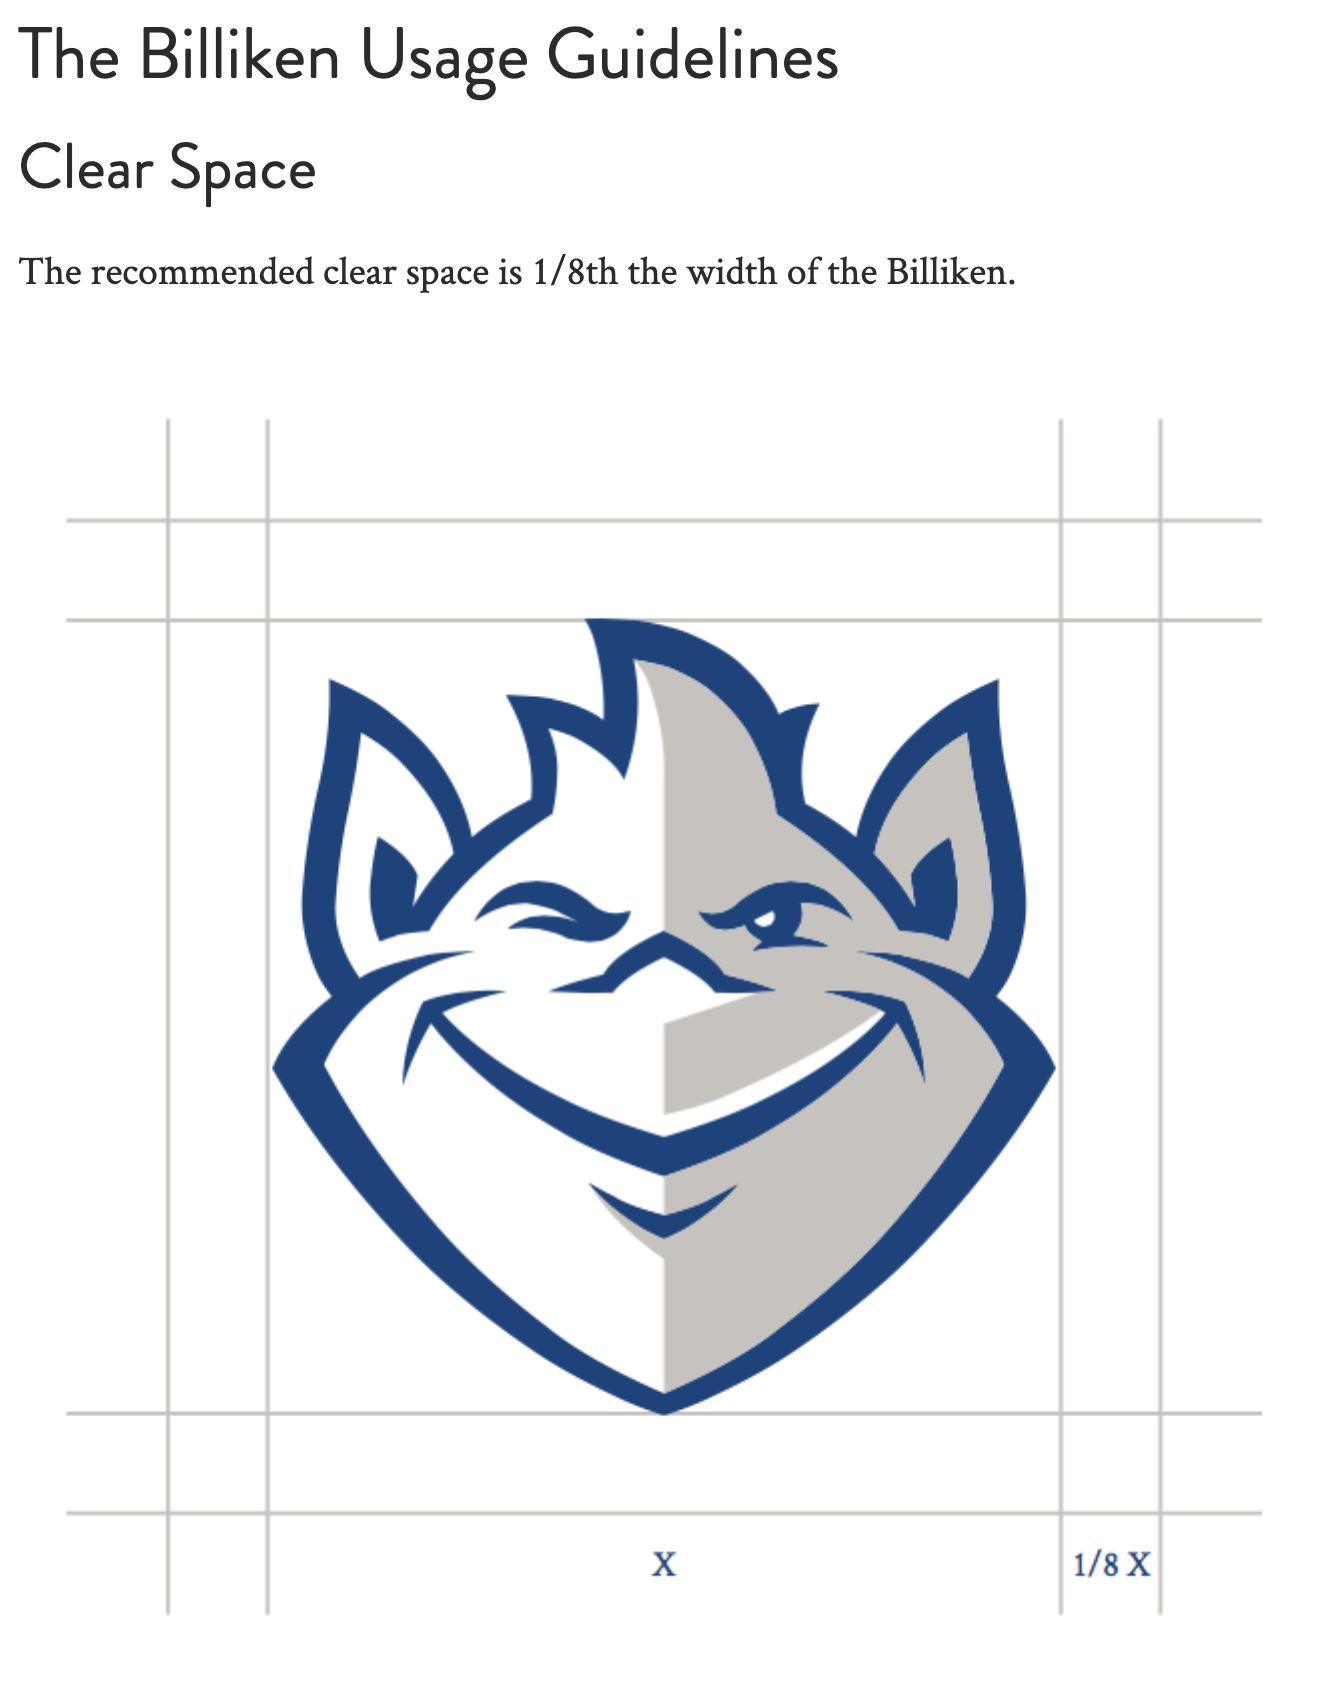 SLU Style Guide Example